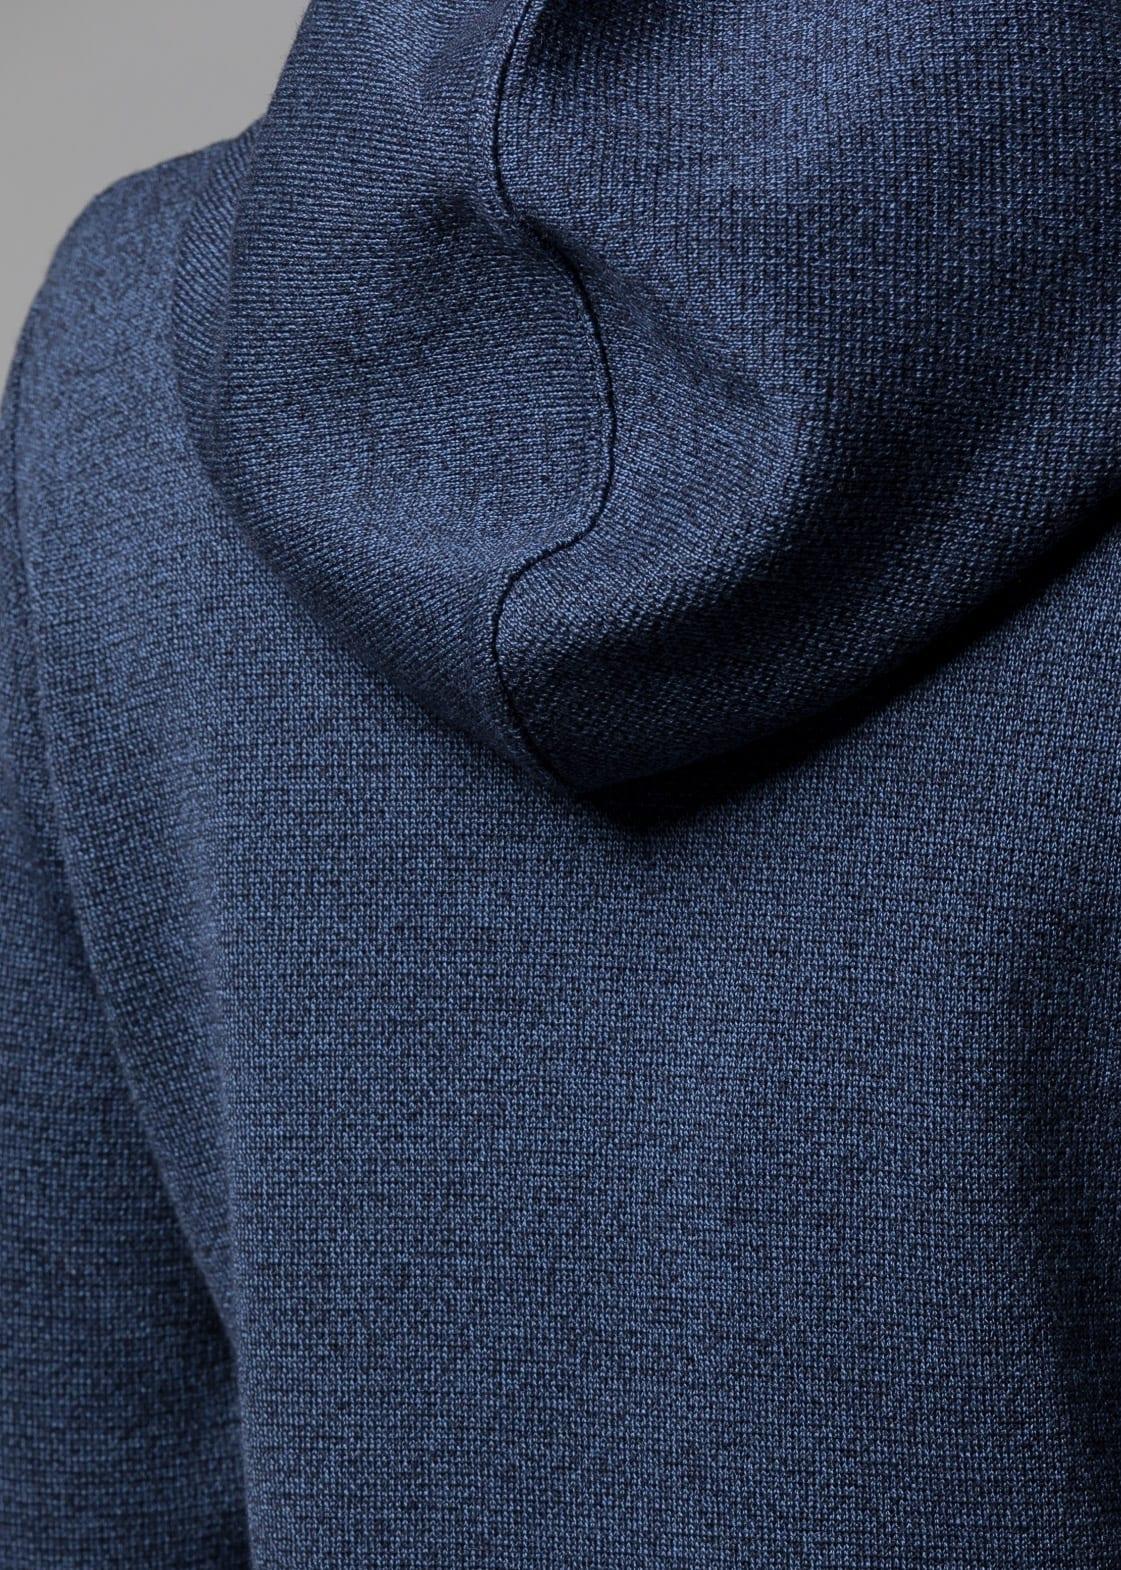 Kapuzenjacke Damen blau Bridget | Merinowolle von CONNEMARA